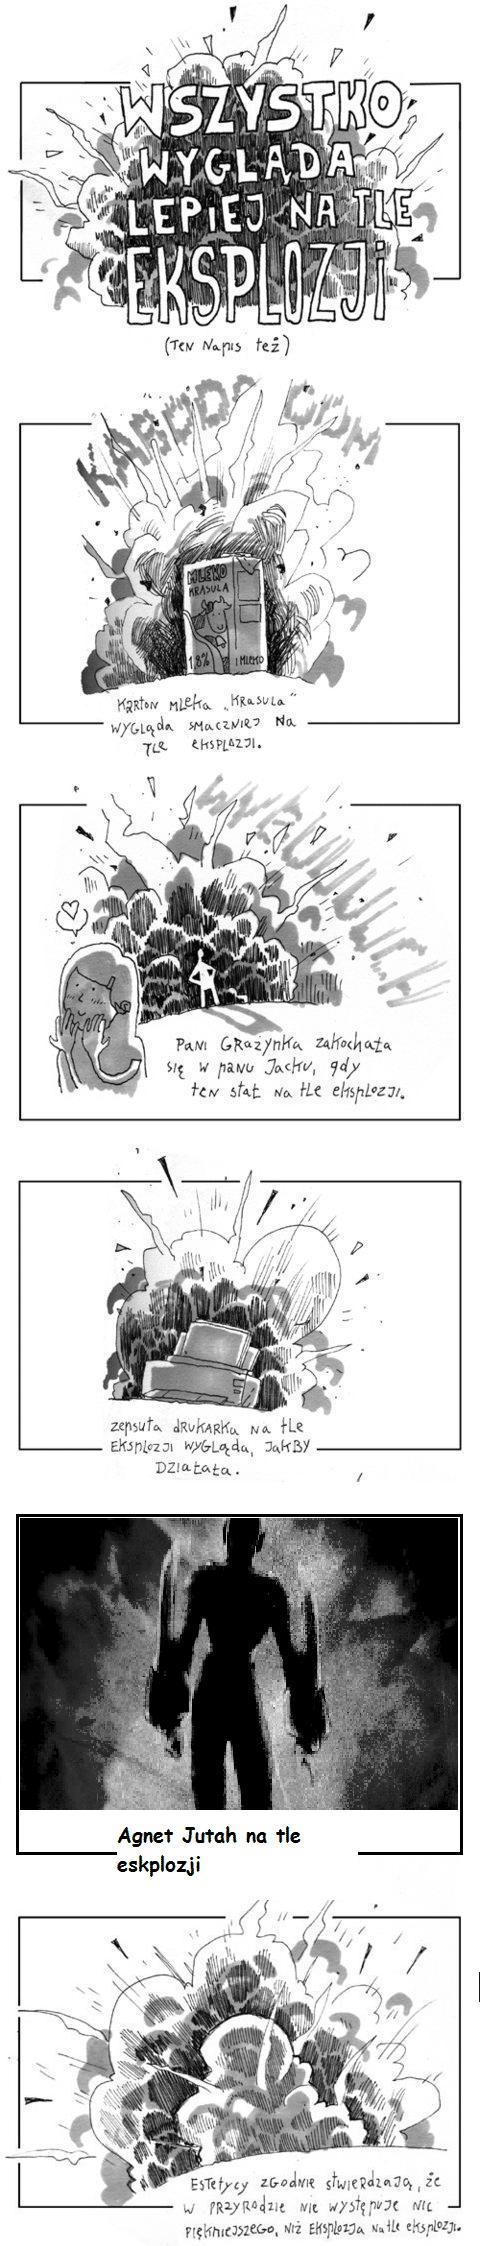 agent jutah na tle eksplozji - Recenzja - Silent Bomber